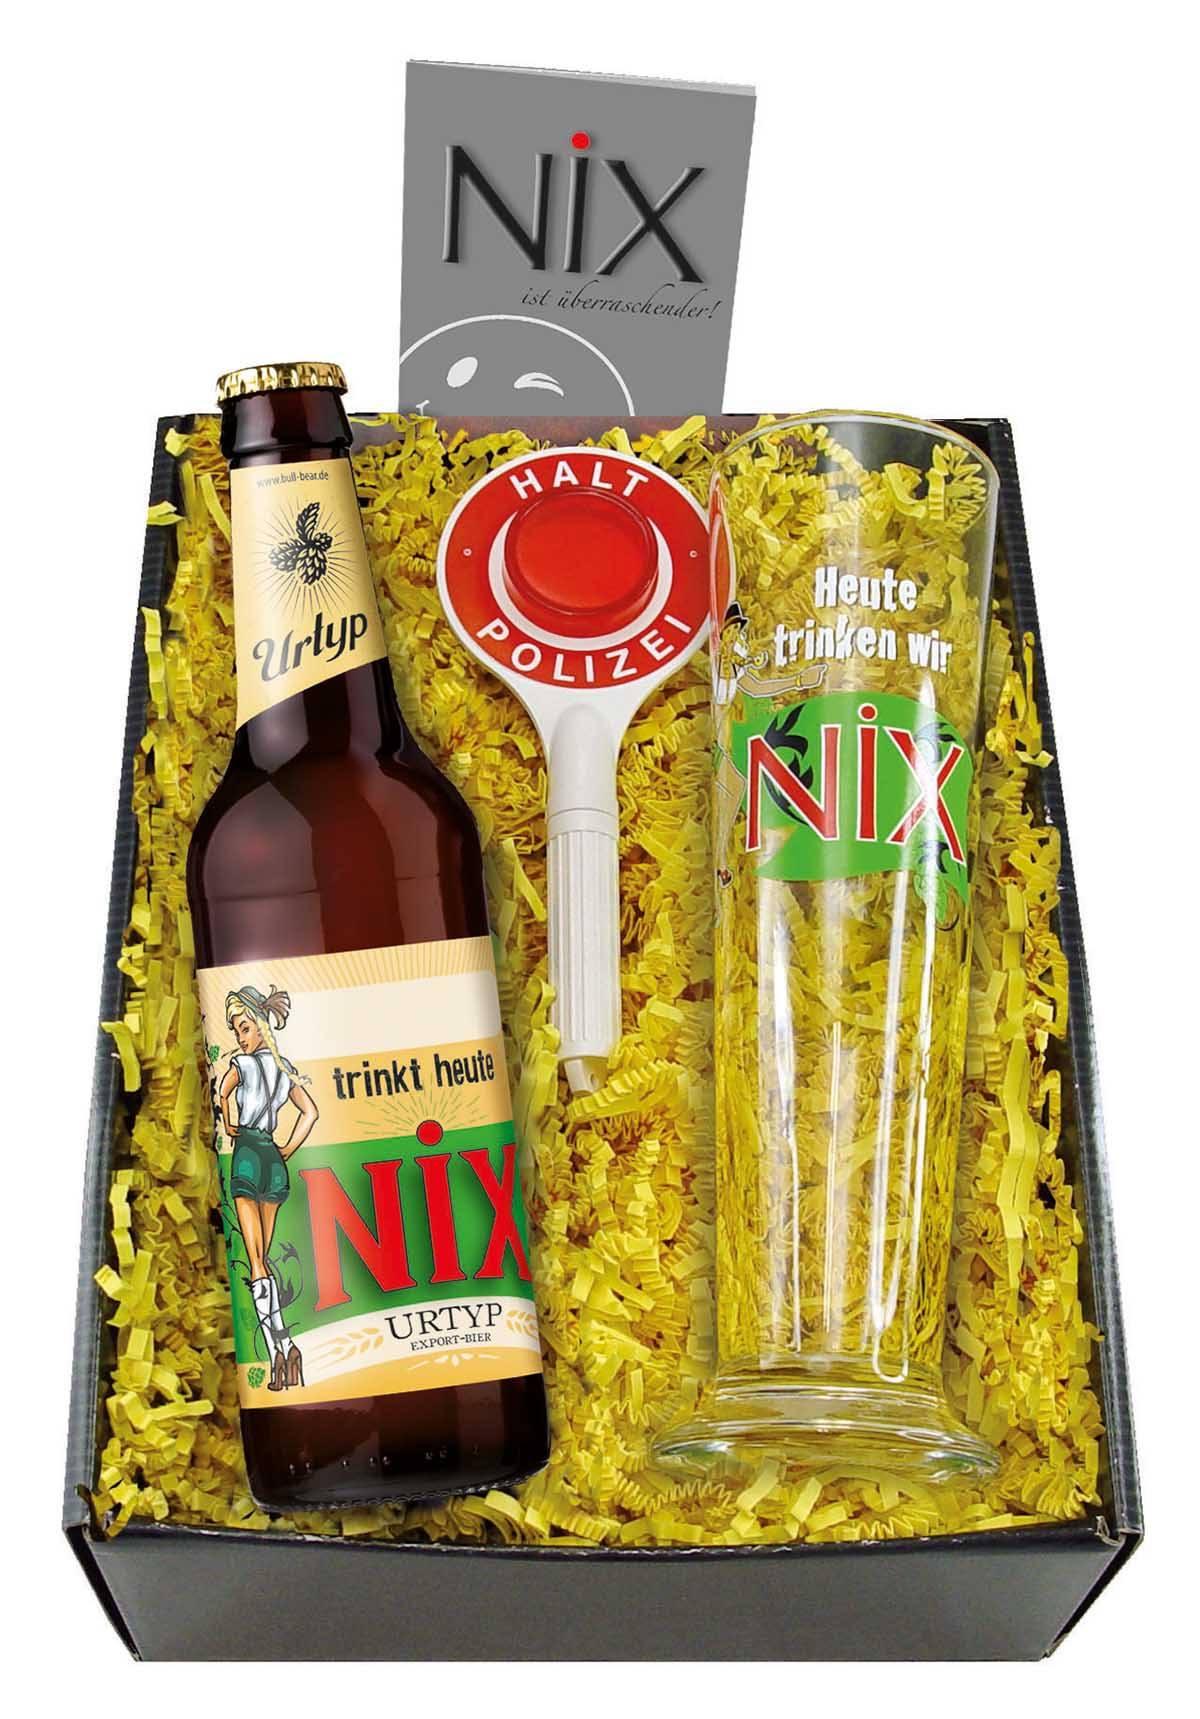 Nix Geschenke  NiX Geschenk Set NiX im Glas